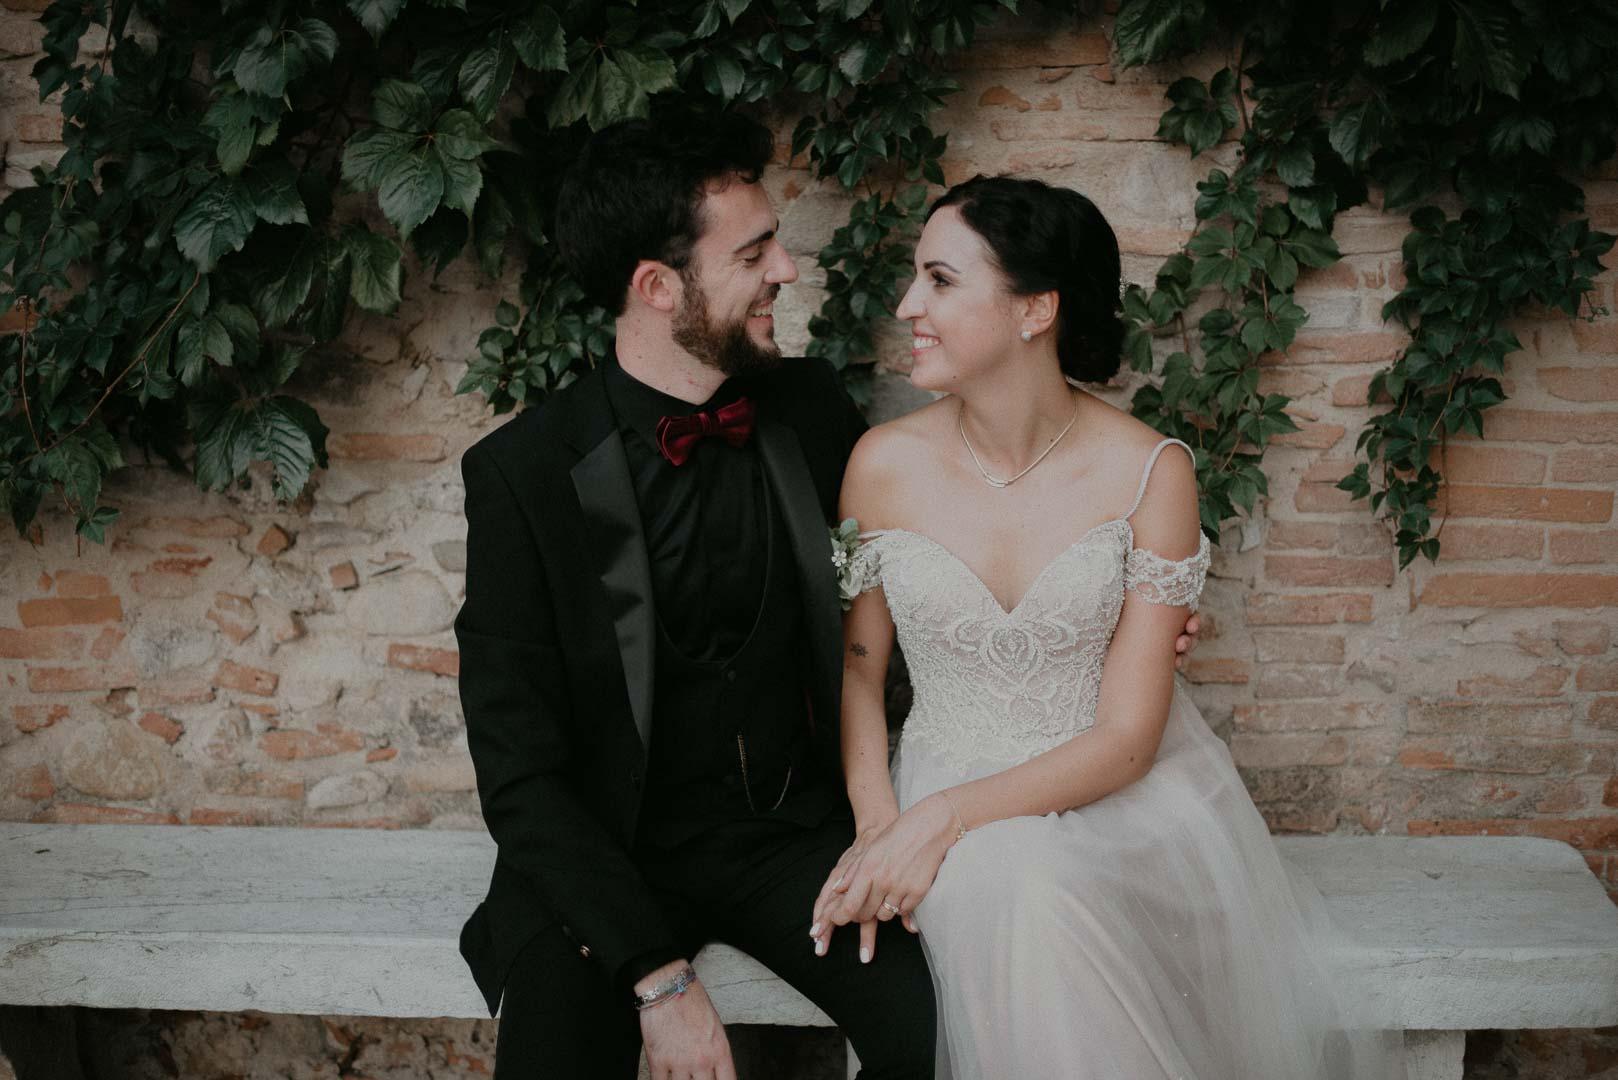 wedding-photographer-destination-fineart-bespoke-reportage-tuscany-villascorzi-vivianeizzo-spazio46-110